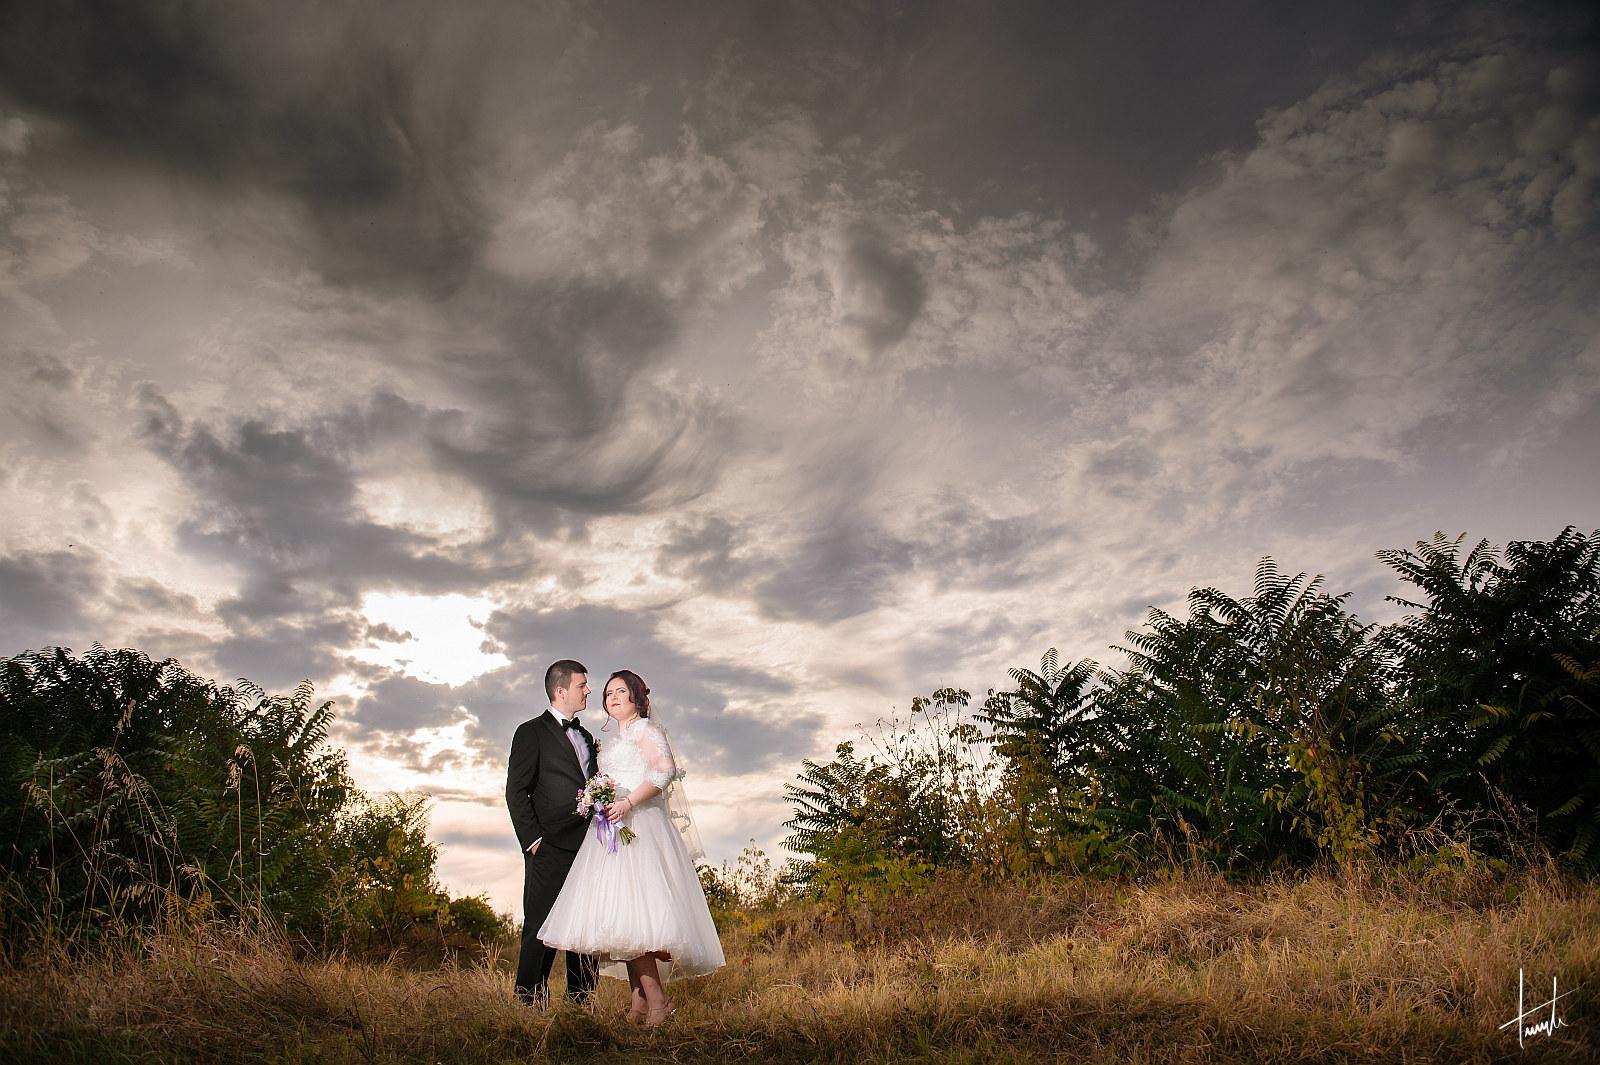 Oana Marius - fotografii de nunta - Bogdan Terente 01